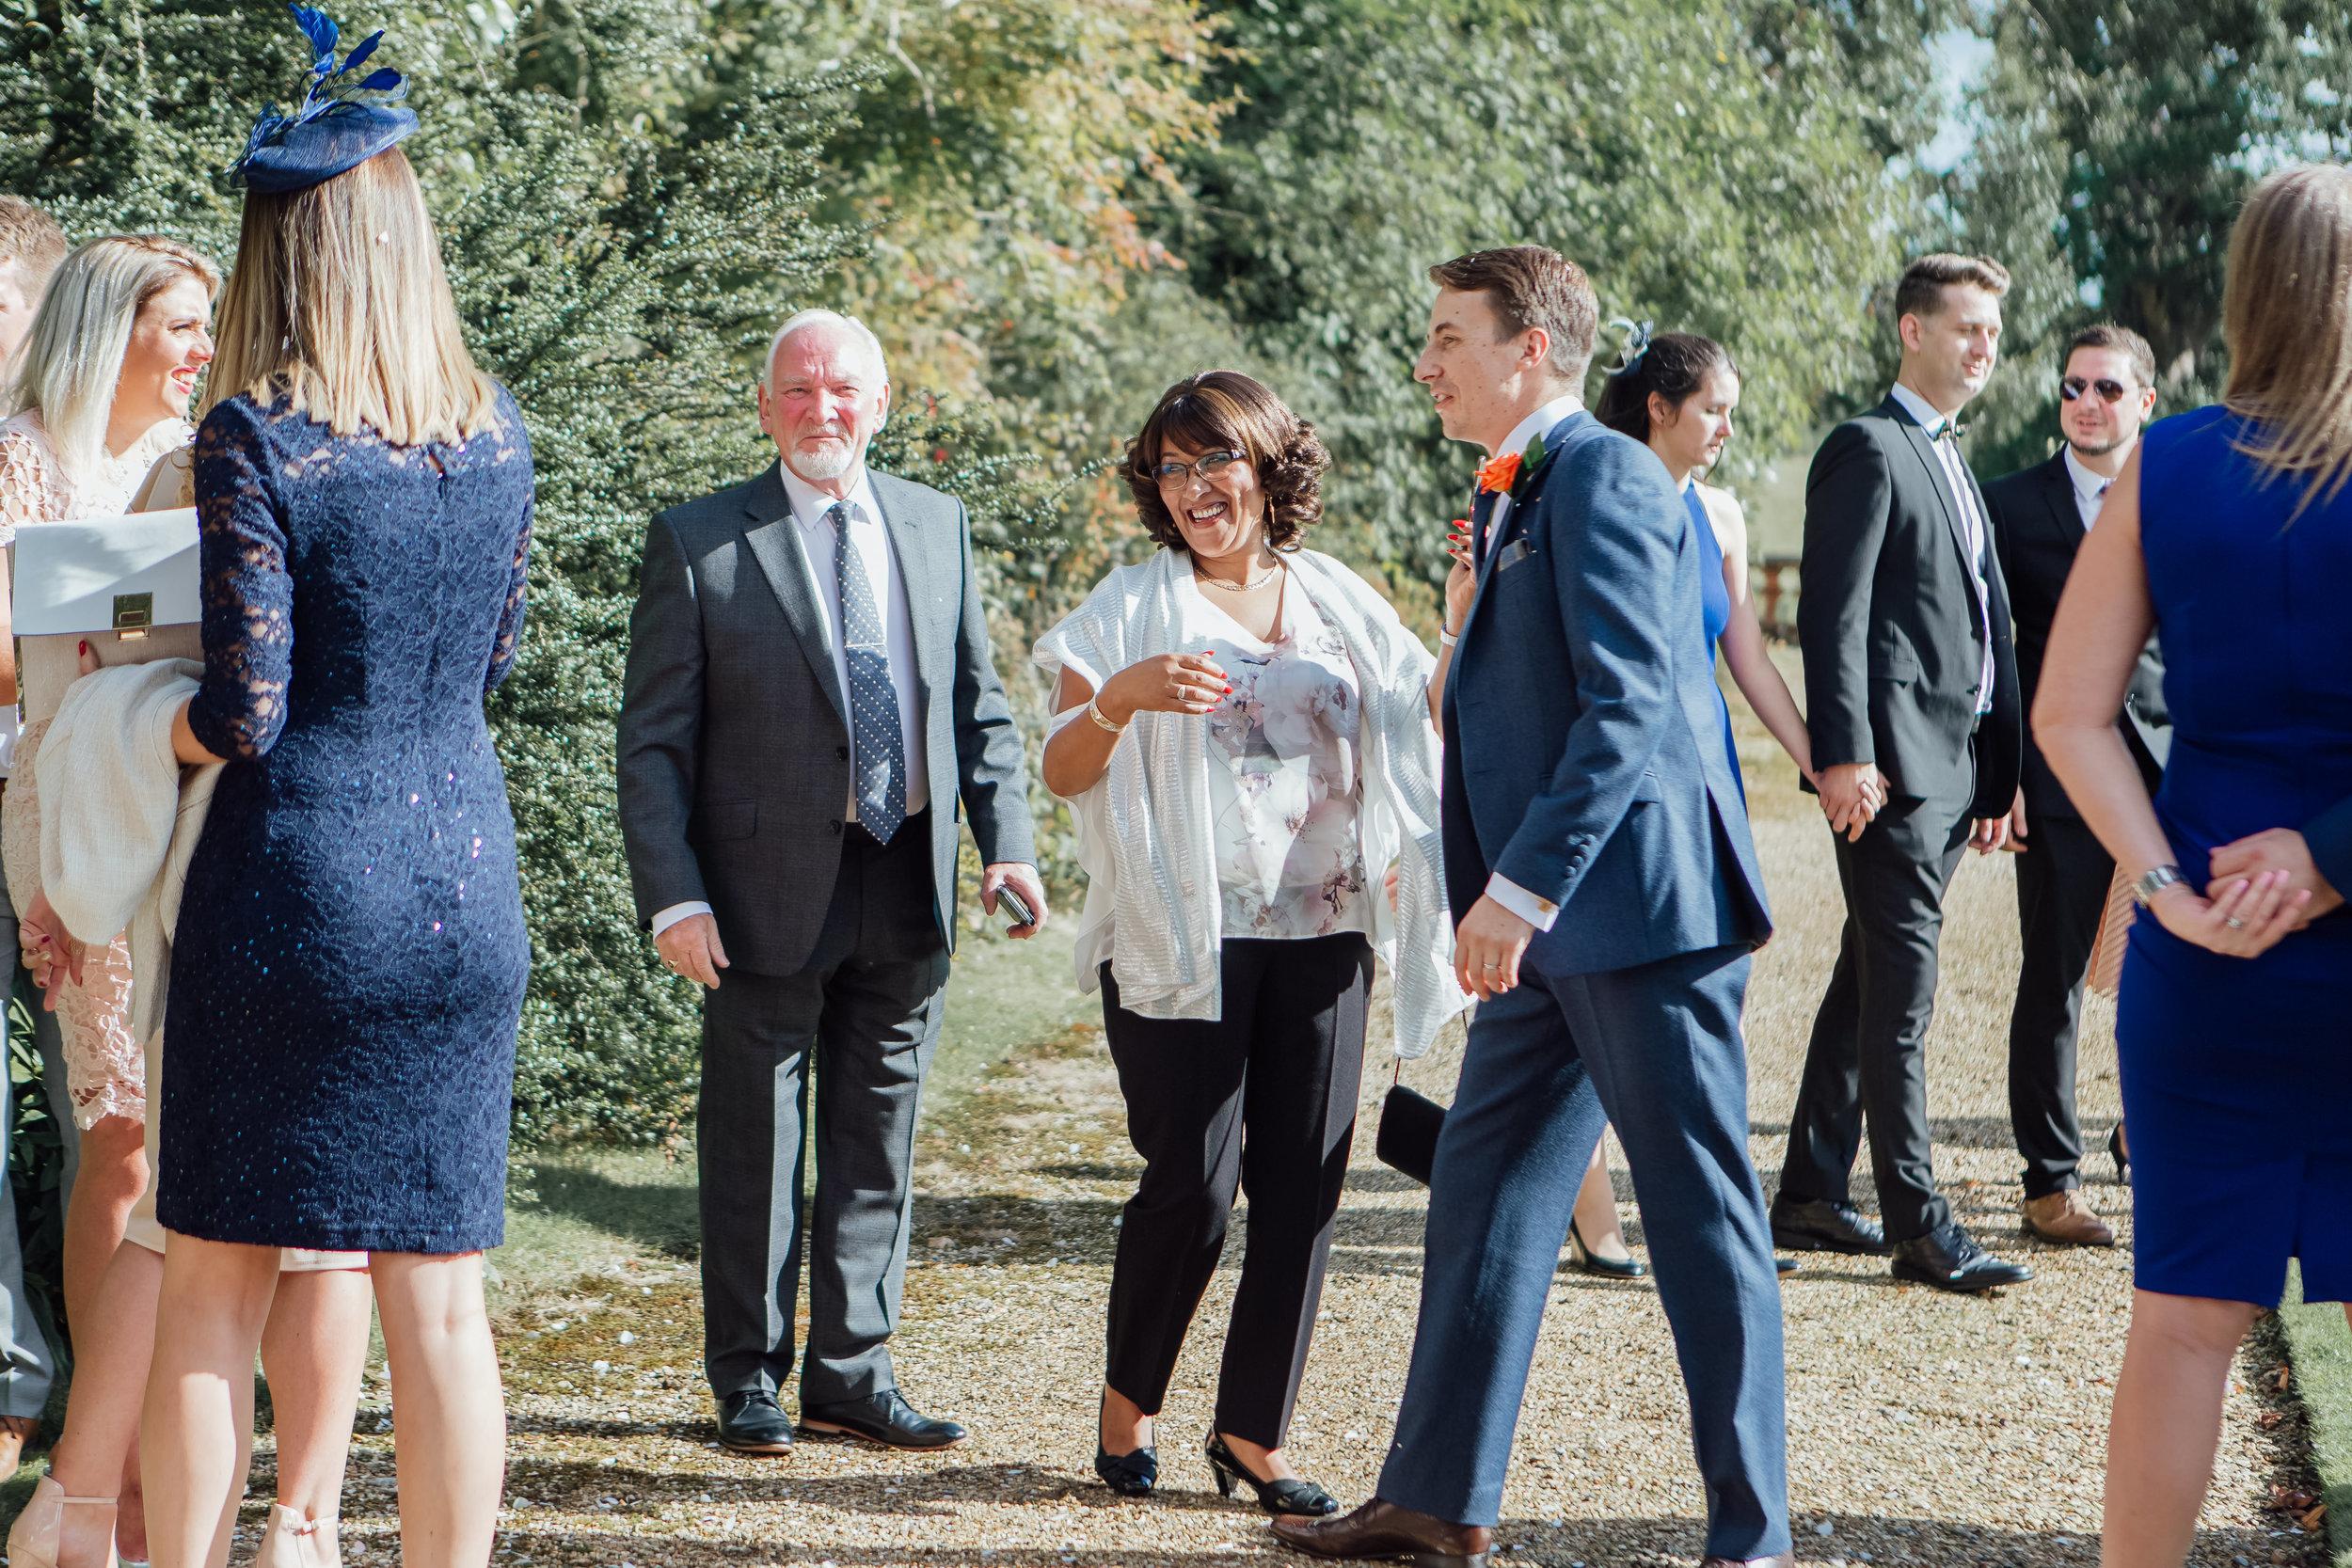 Candid wedding guest photographs - documentary wedding photographer - Amy James photography - Hampshire wedding photographer